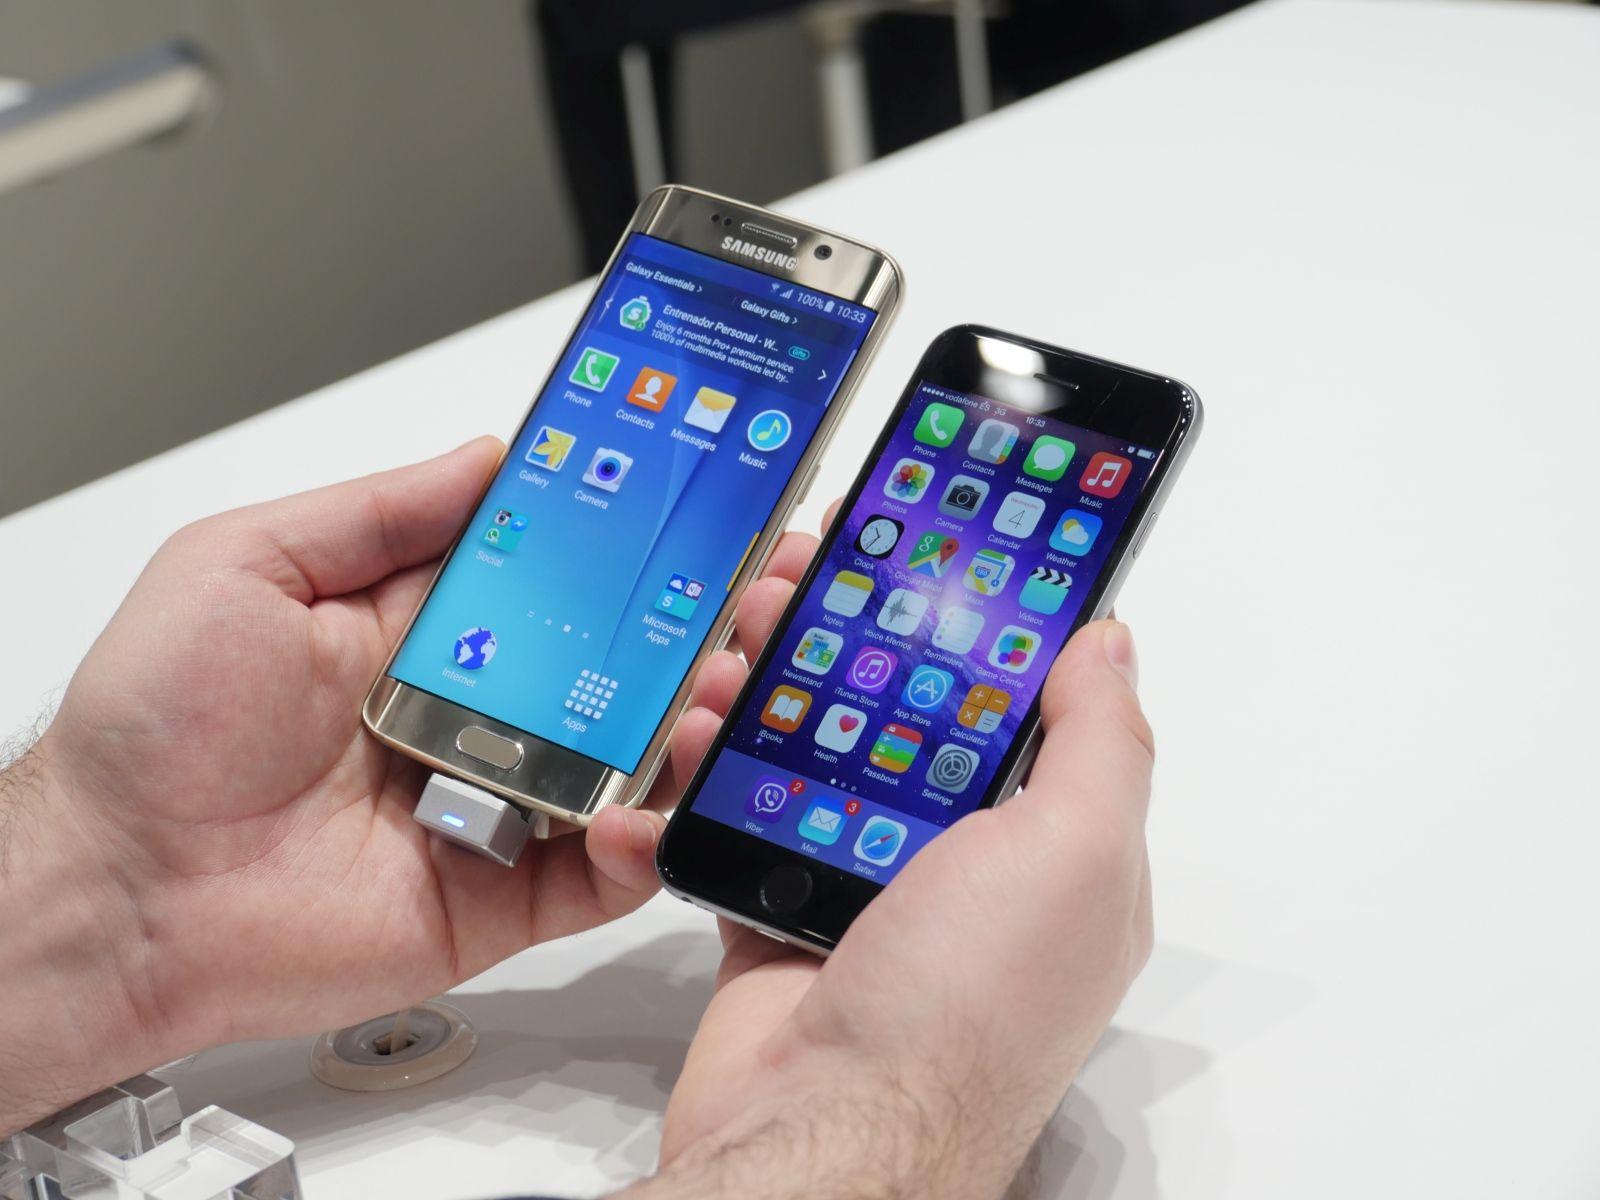 samsung galaxy s6 edge vs apple iphone 6 plus camera. Black Bedroom Furniture Sets. Home Design Ideas